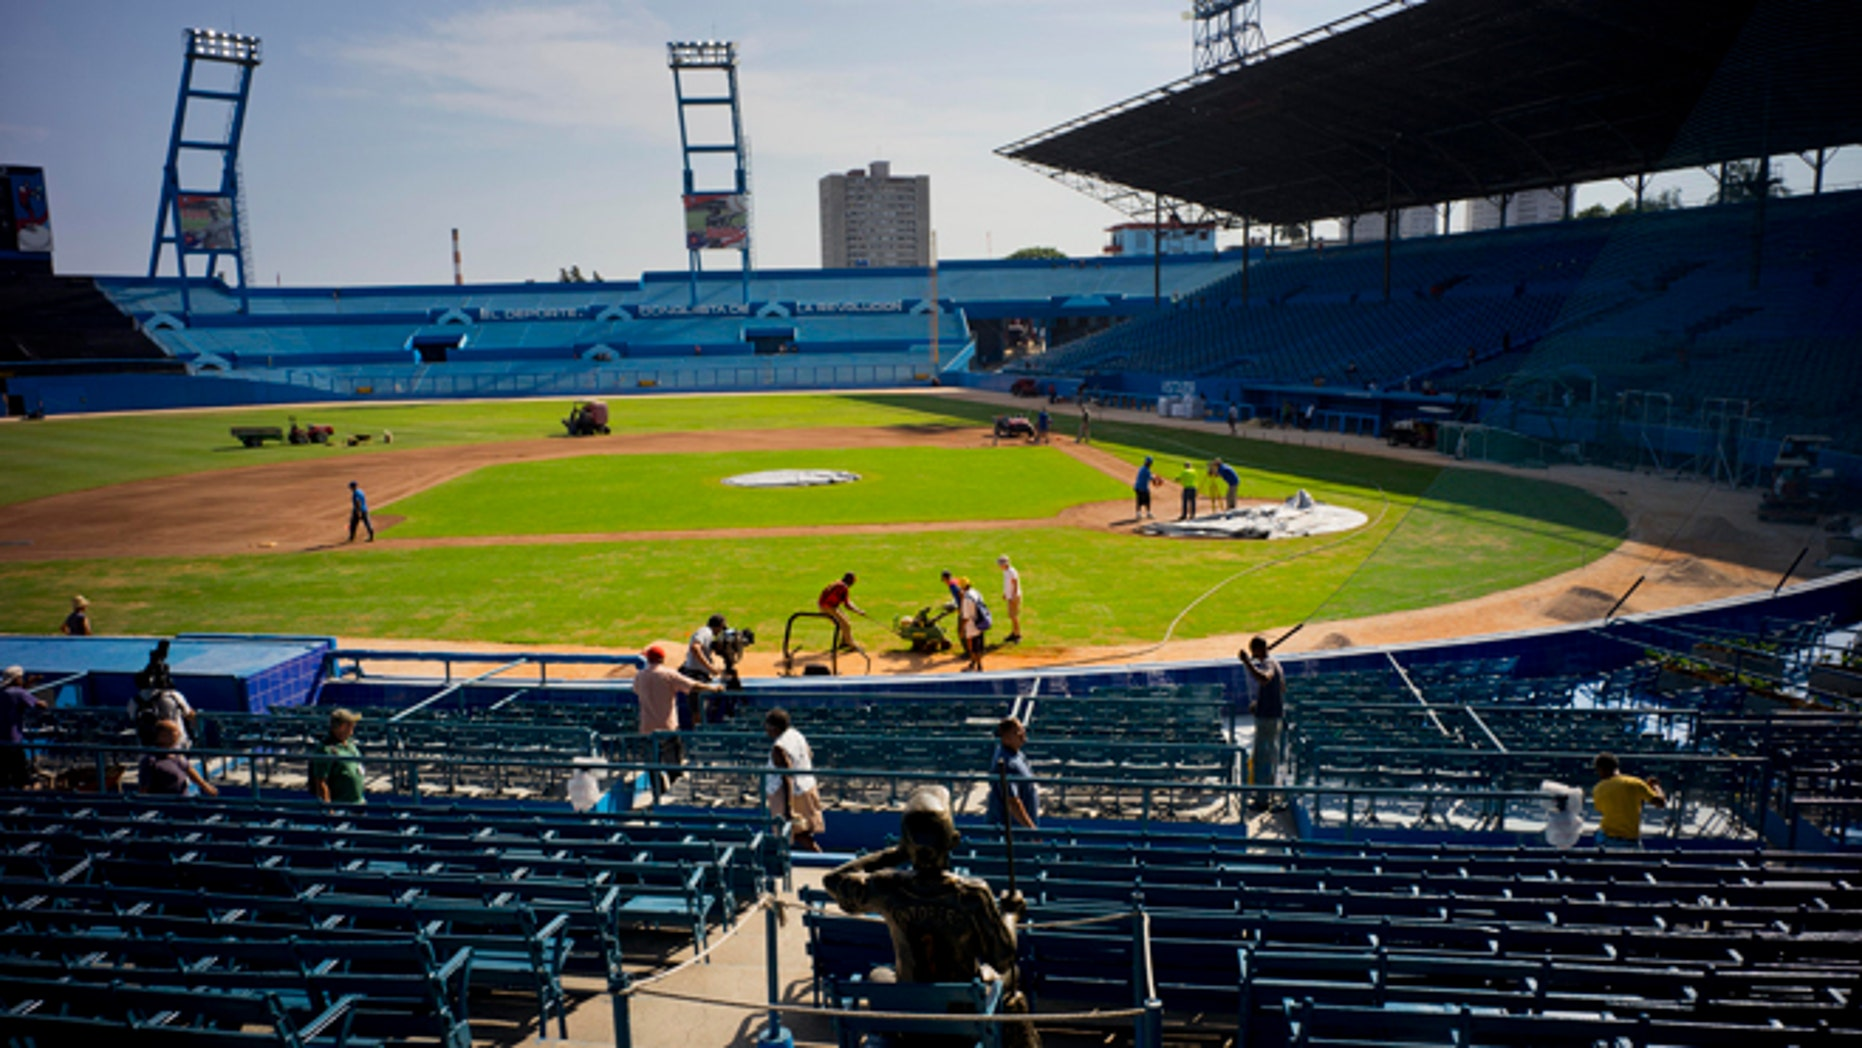 Havana's Latinoamericano stadium on Wednesday, March 16, 2016.